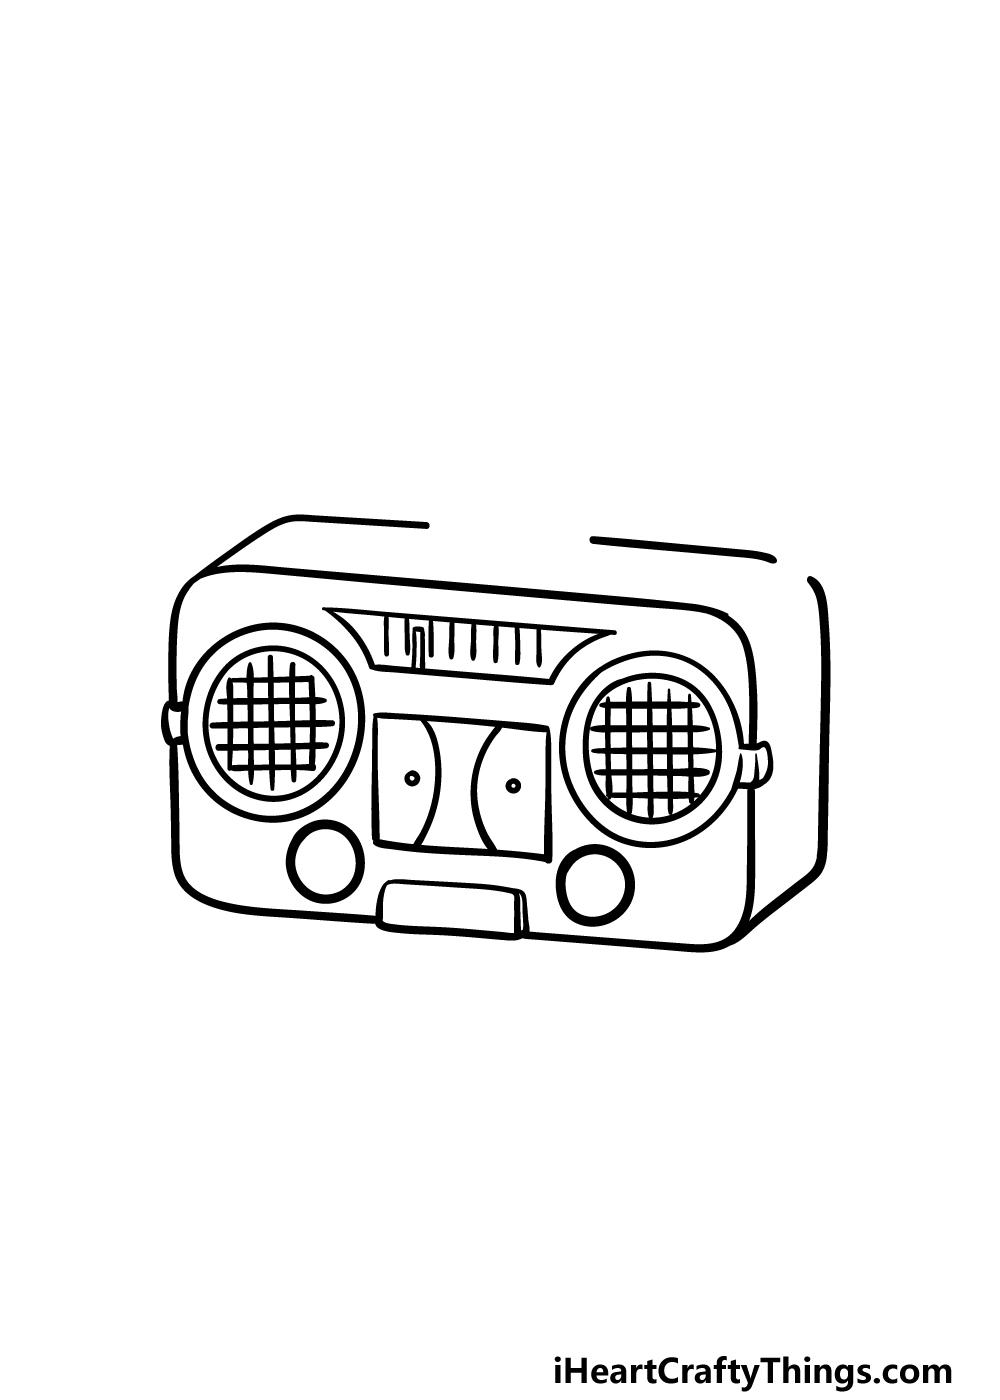 drawing a radio step 3